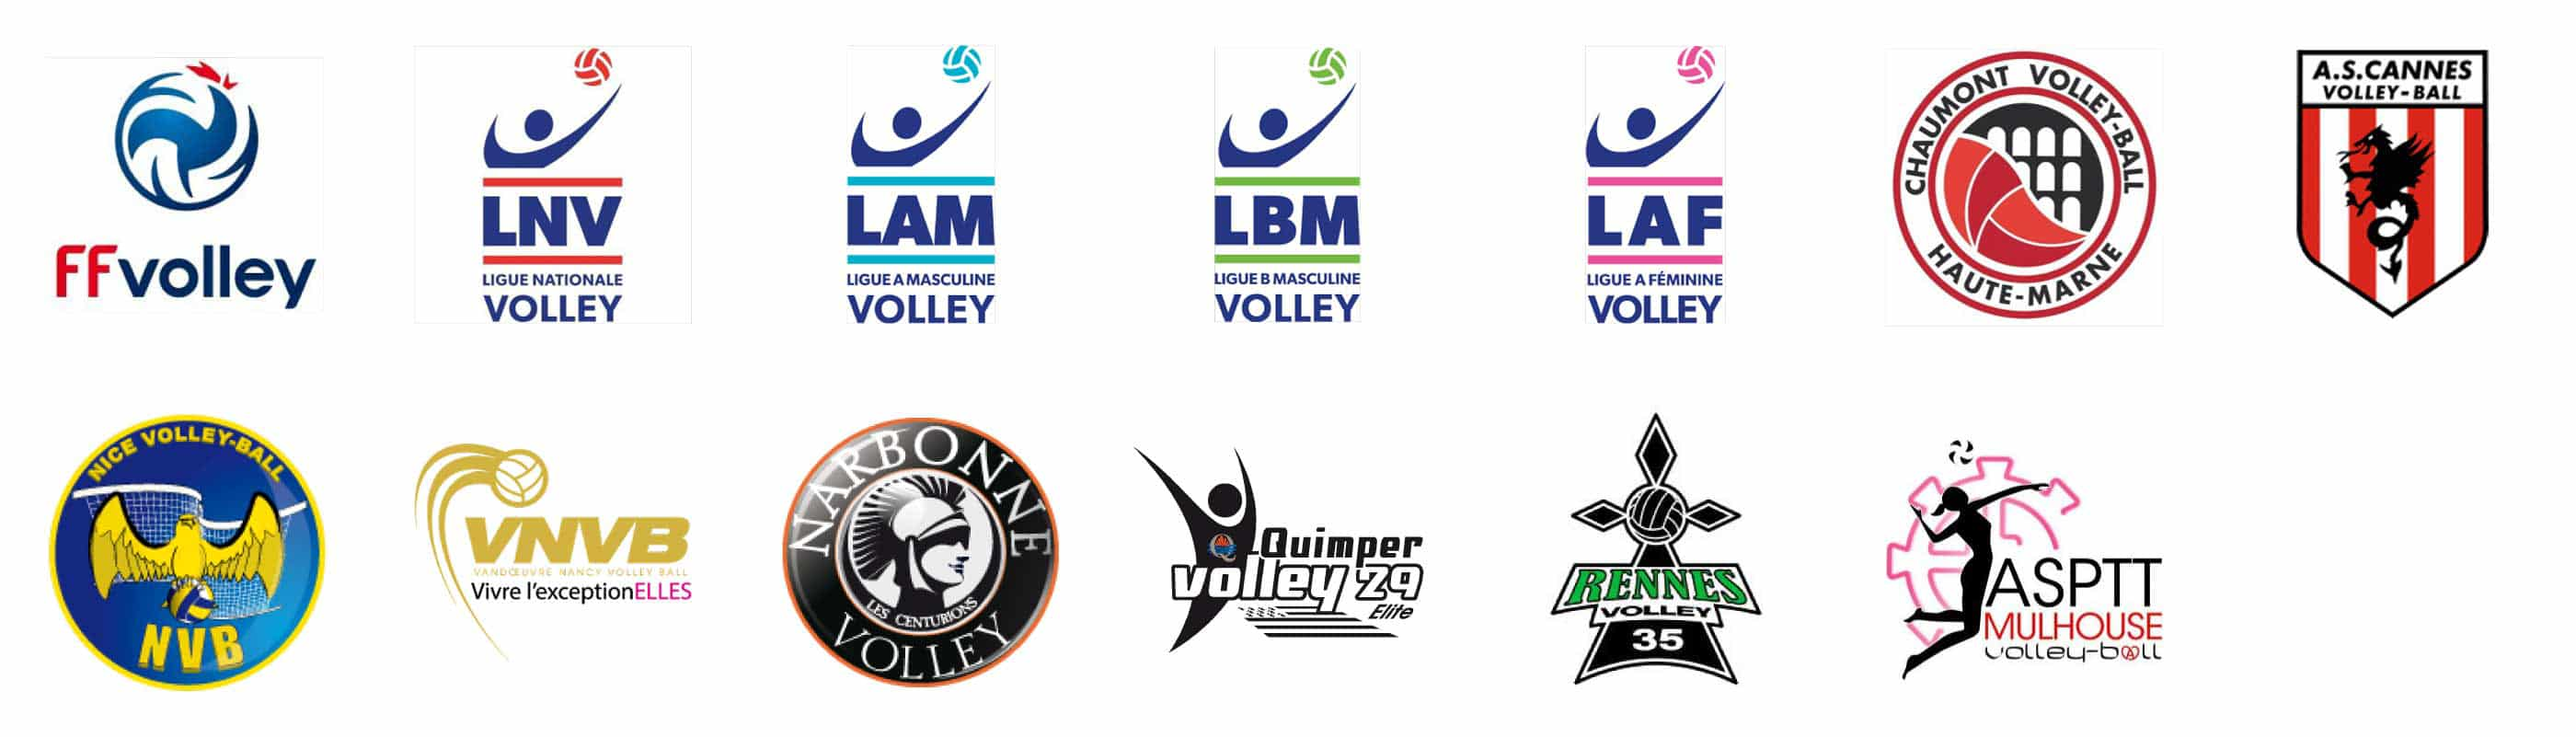 Nakara Sport communication volley-ball